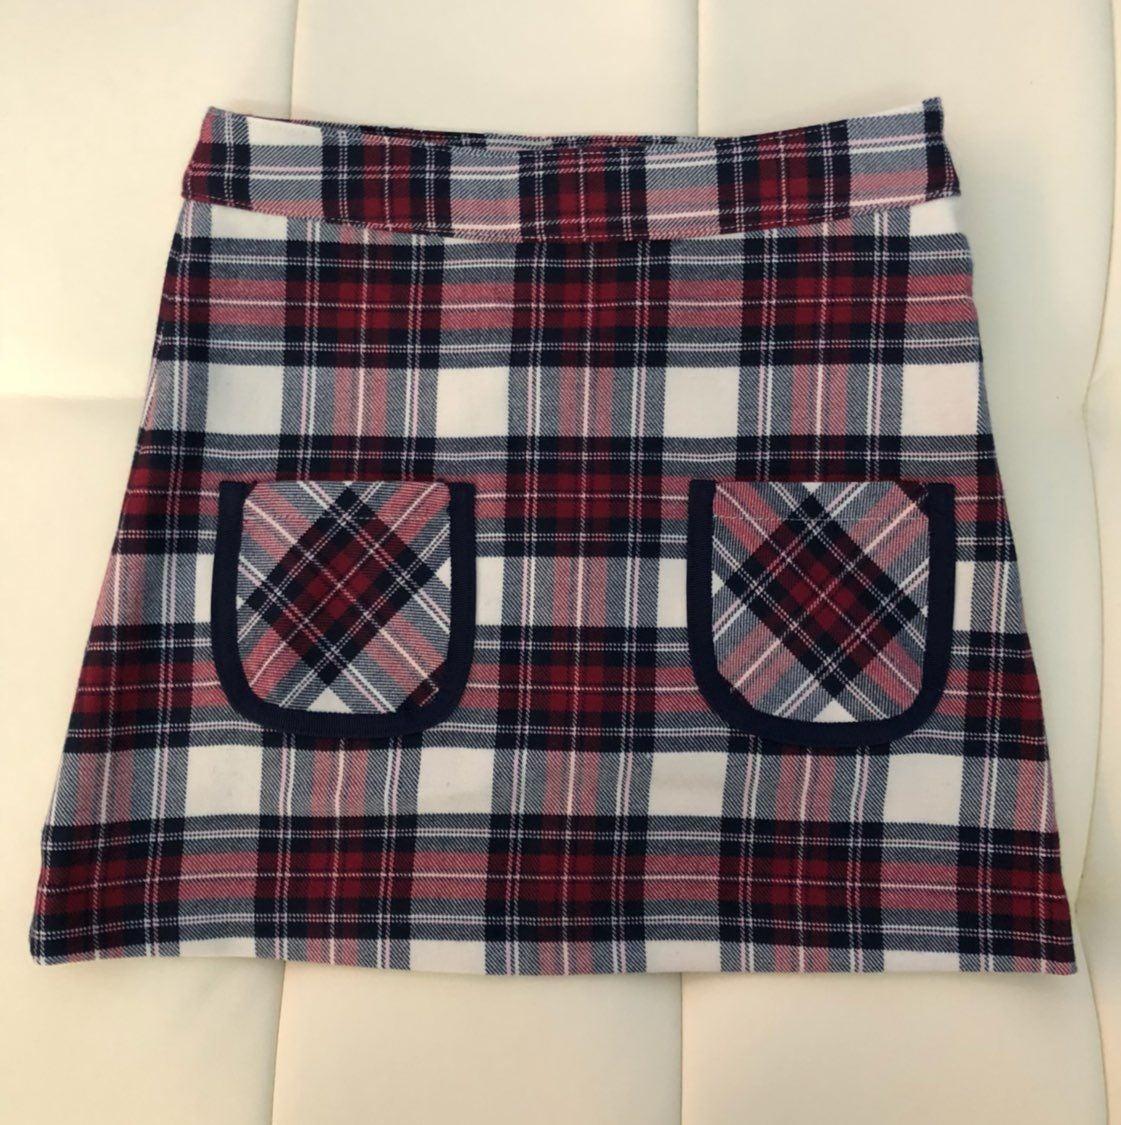 NWT Brooks Brothers Girls Plaid Skirt 5